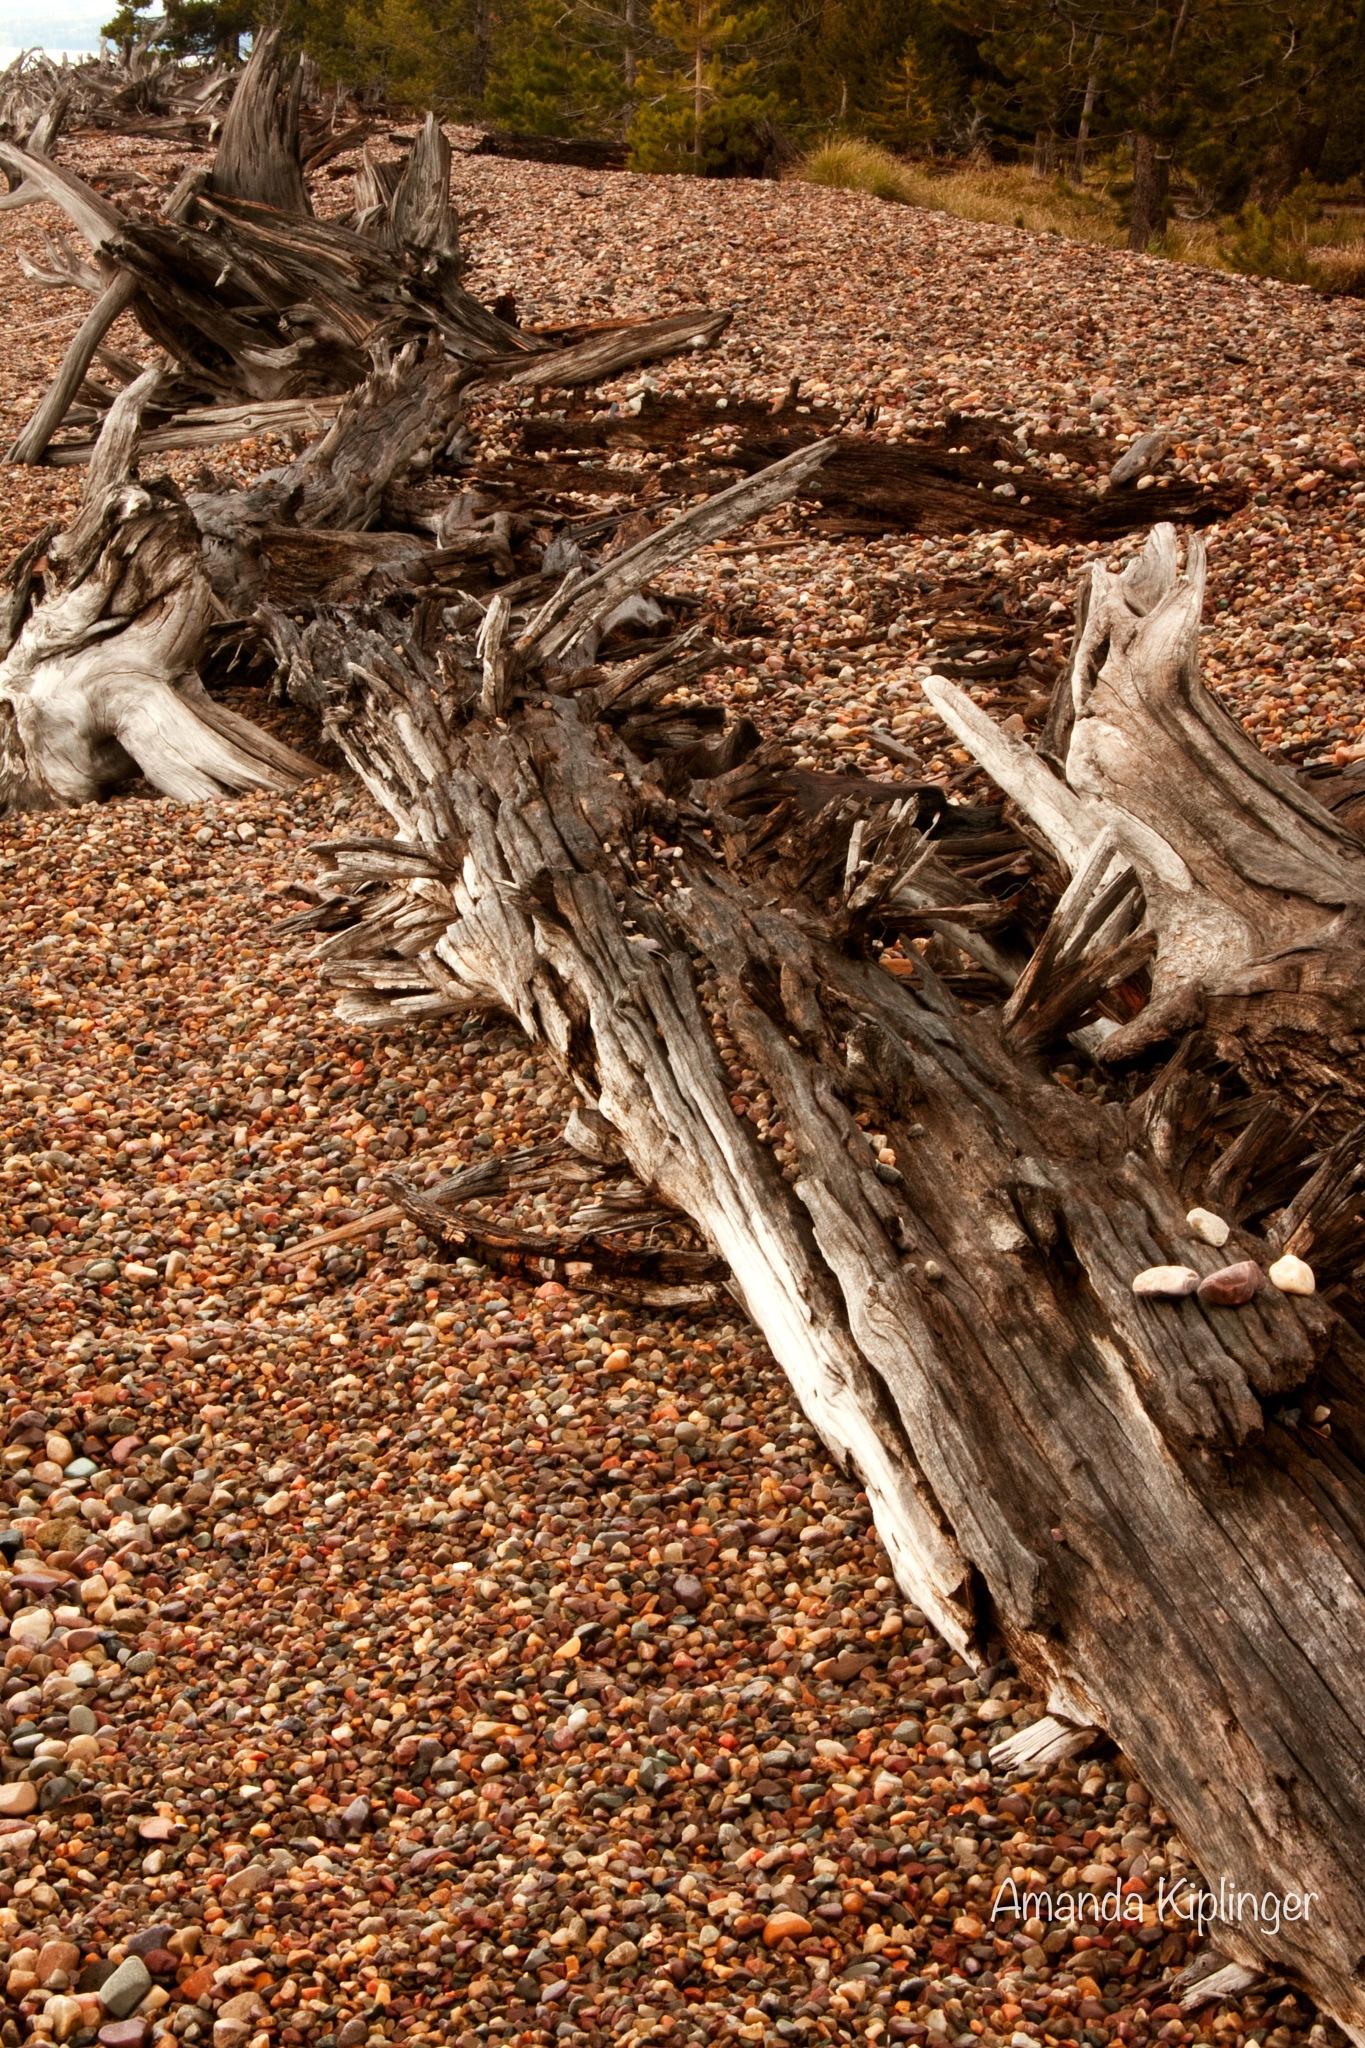 Driftwood and Rocks by Amanda Kiplinger